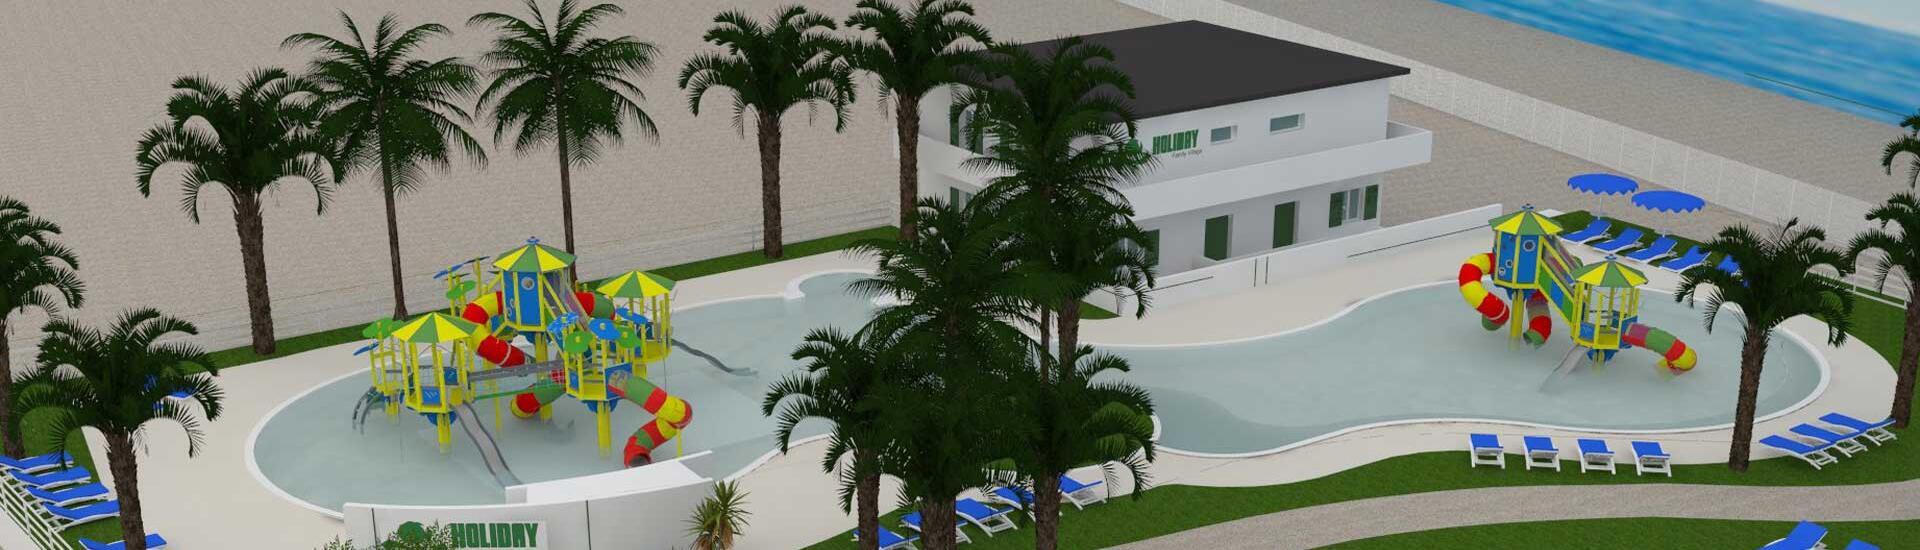 holidayfamilyvillage de pools 012